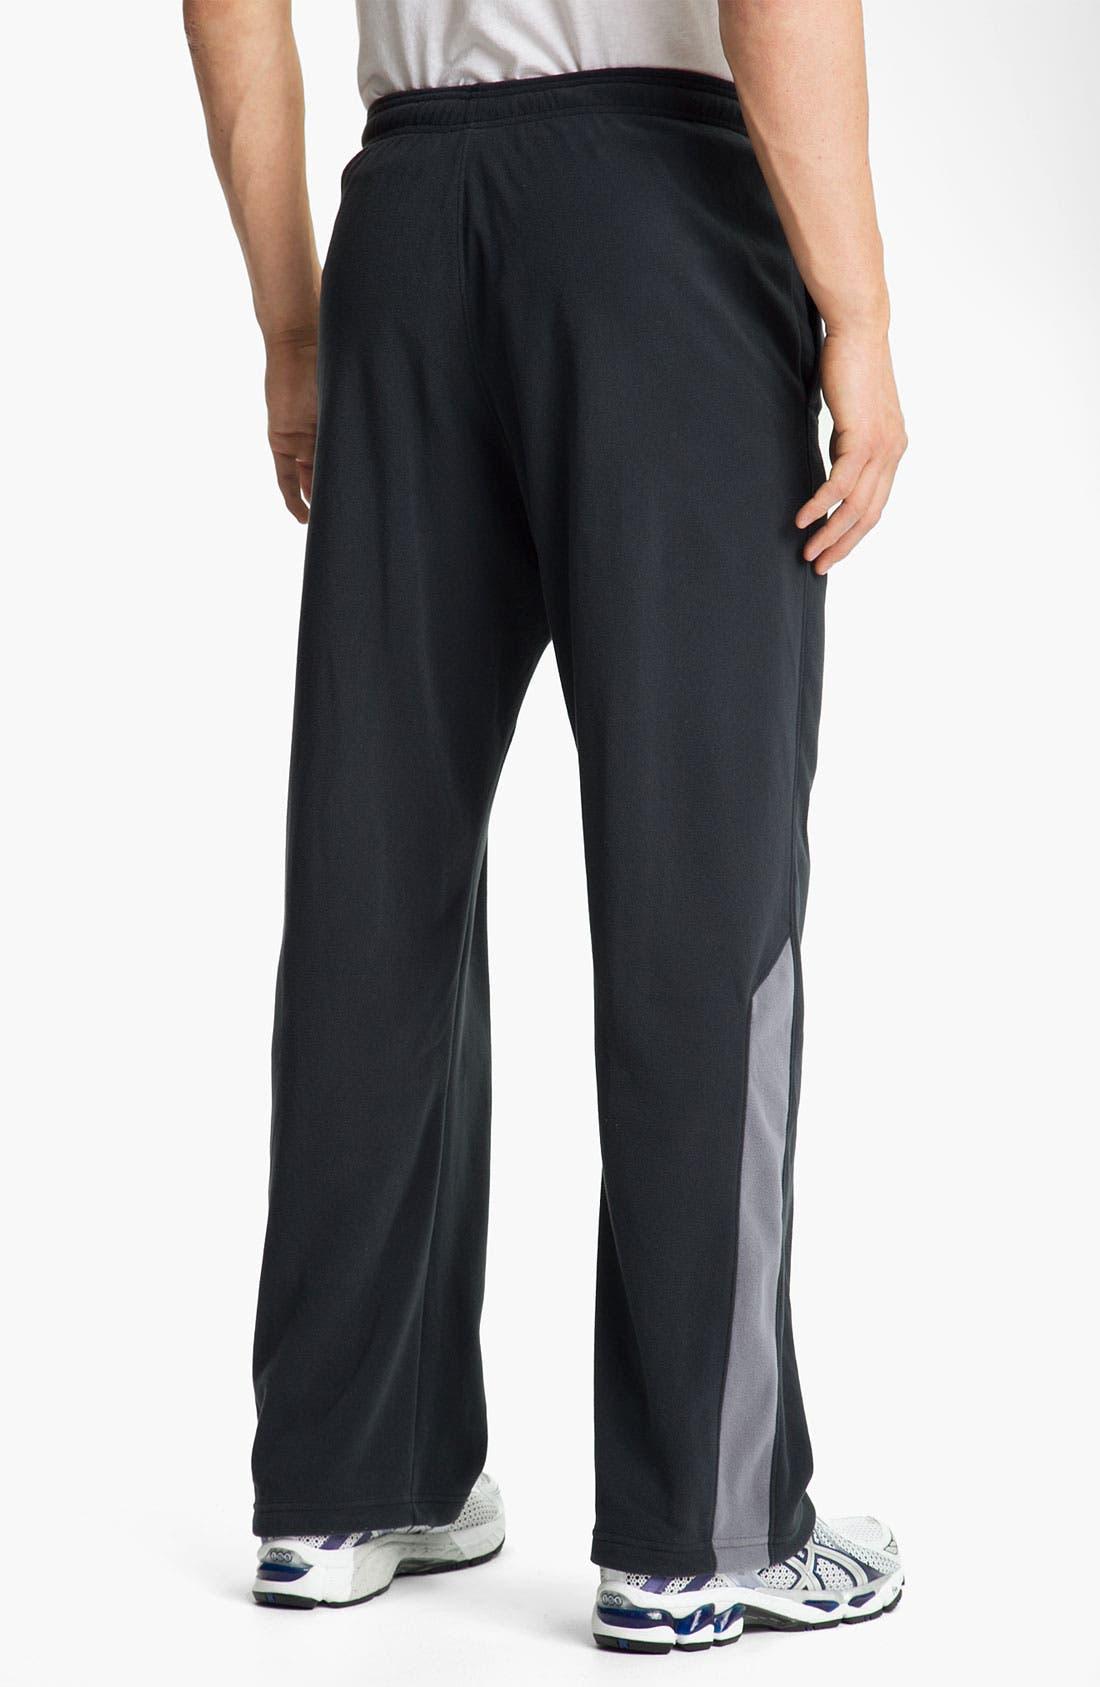 Alternate Image 2  - Under Armour 'Fever' Fleece Pants